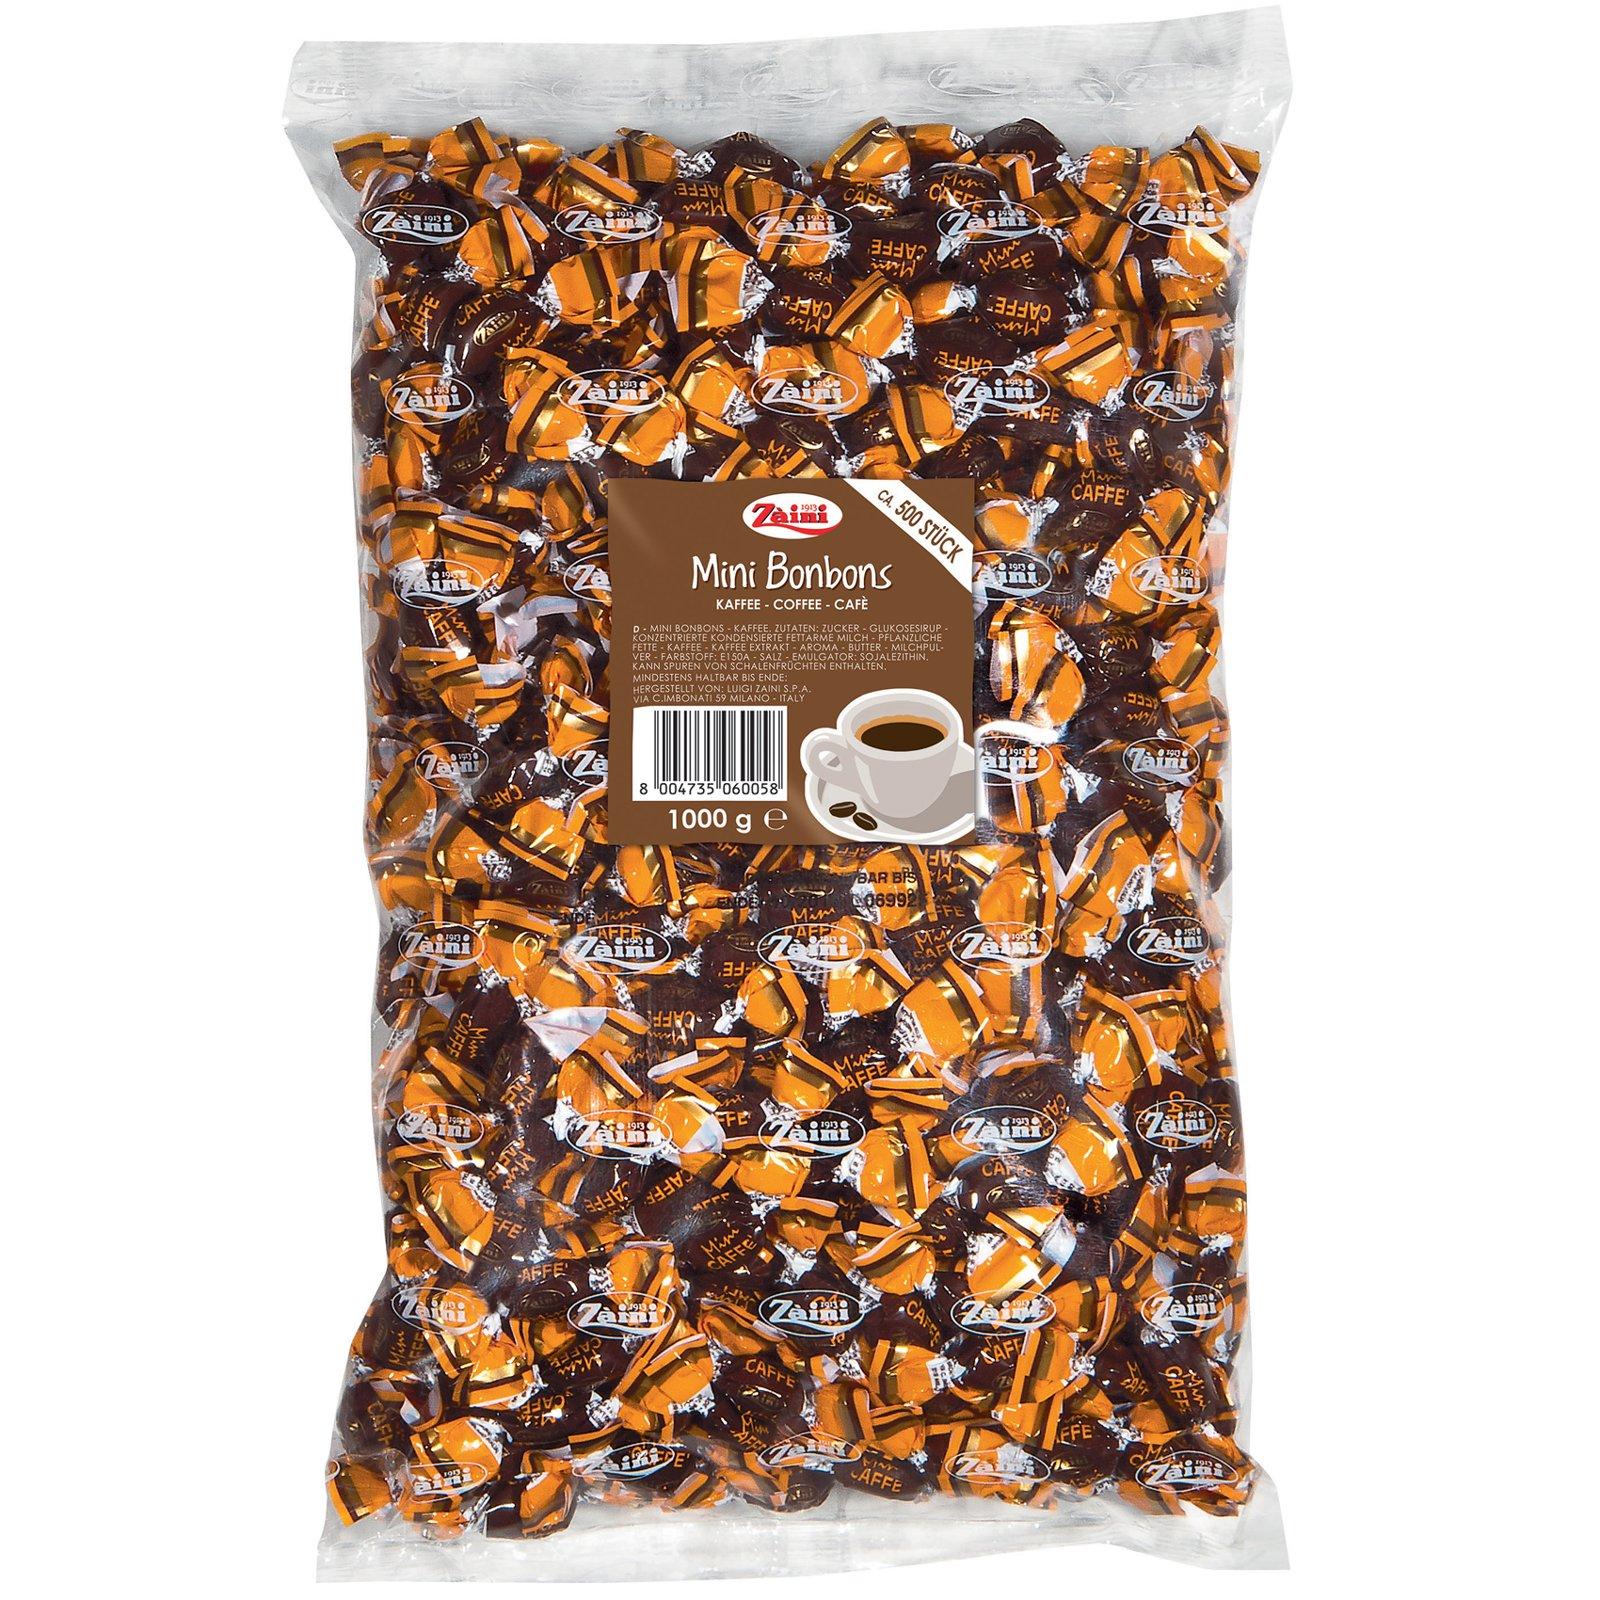 Zaini Mini Bonbons Kaffee 1000g